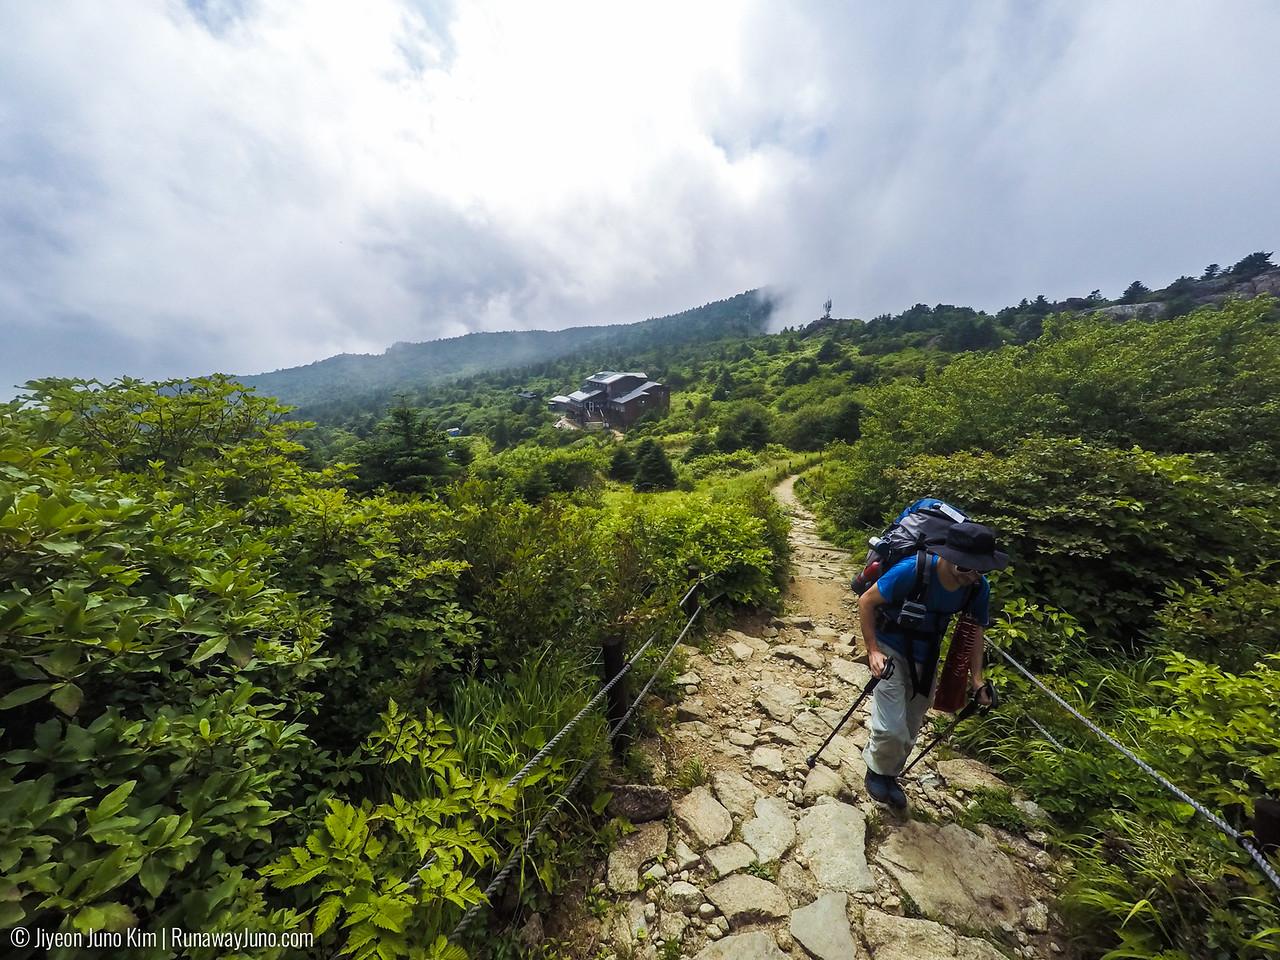 Leaving Seosuk Shelter